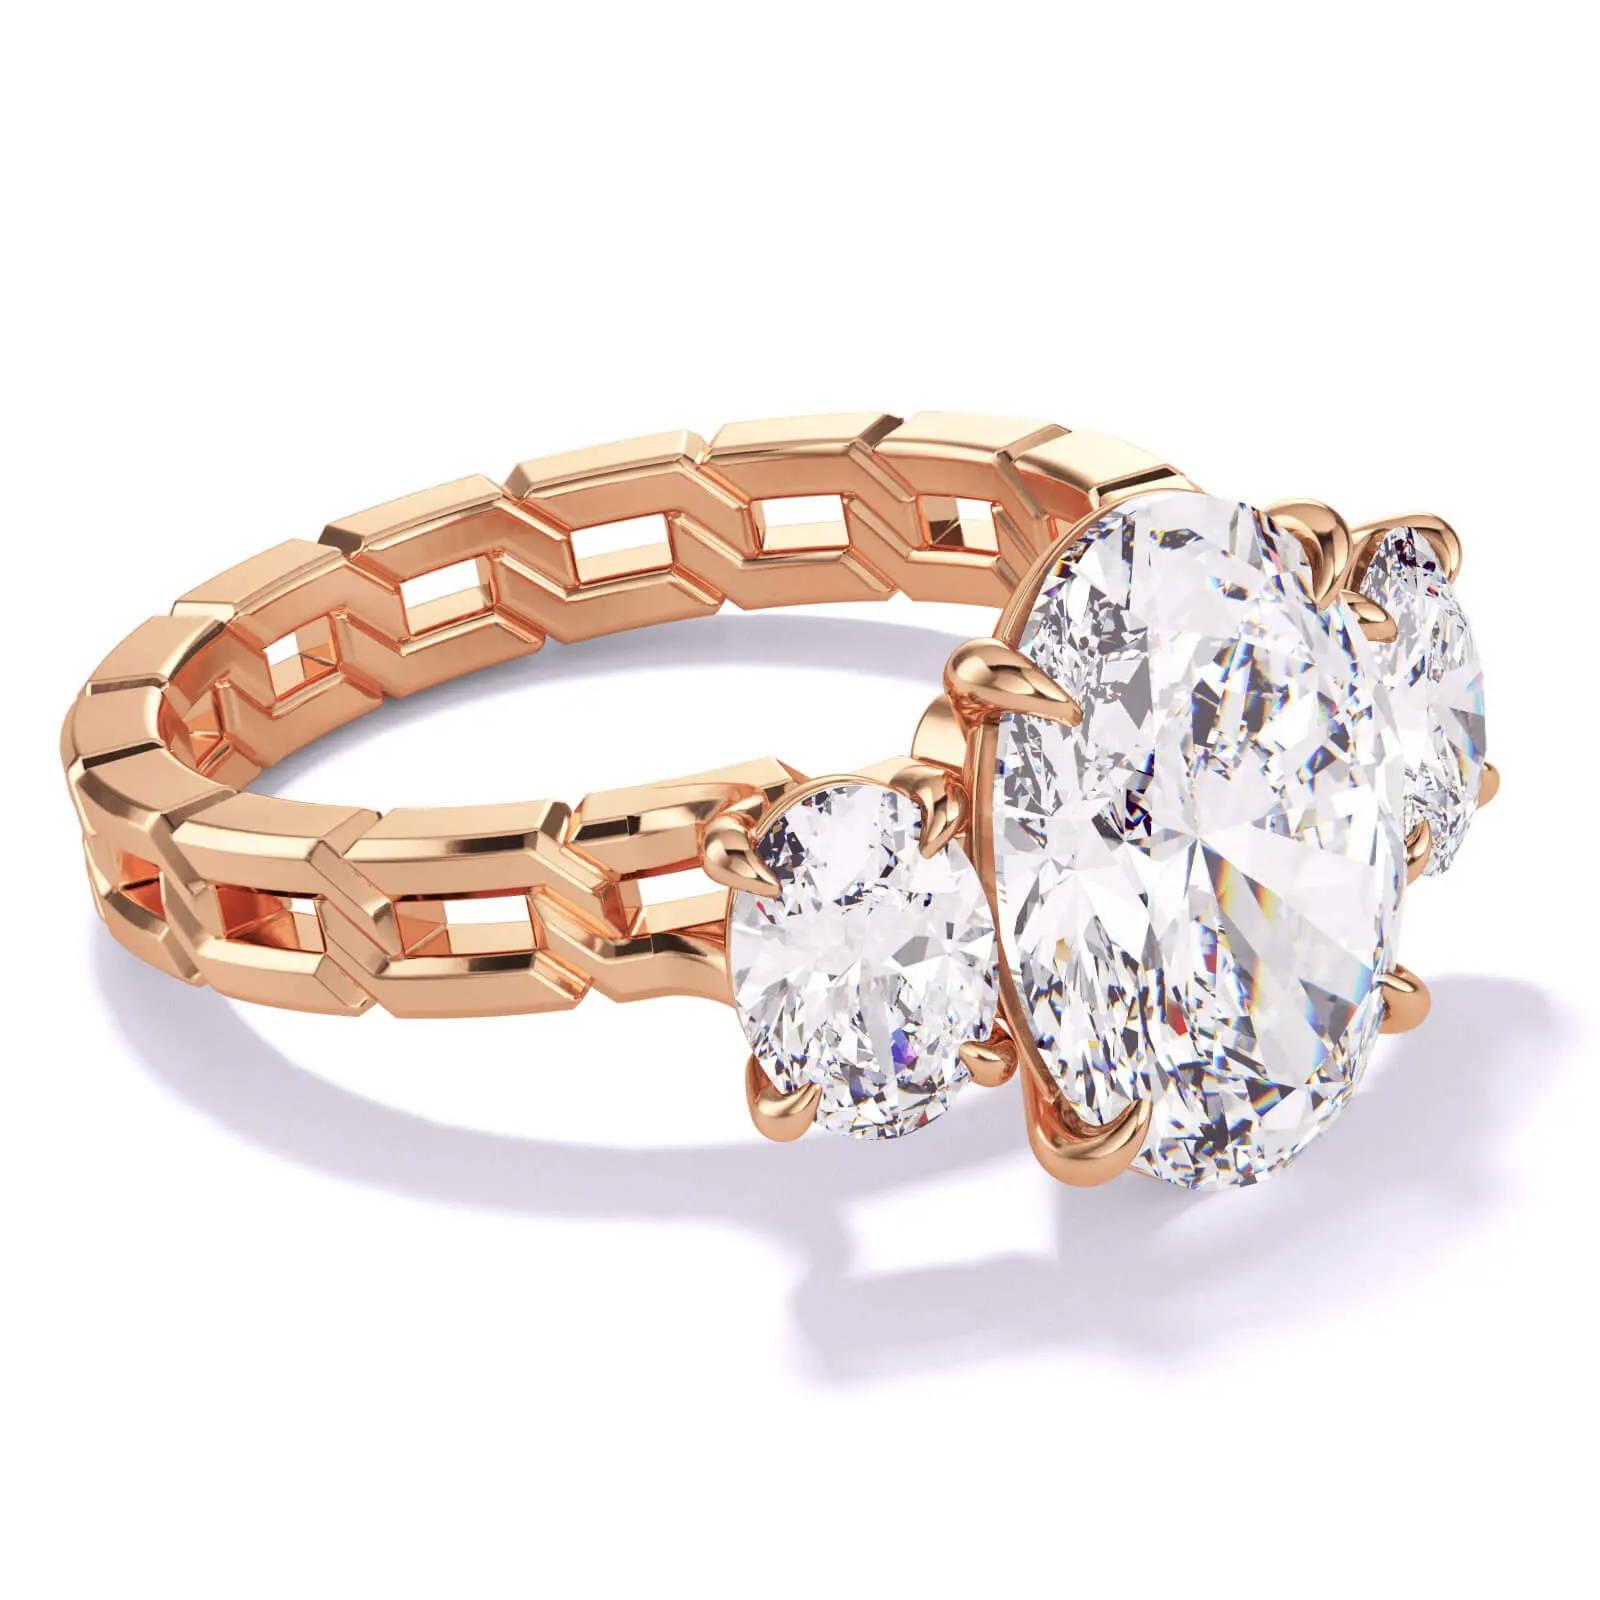 Lindsey Scoggins Studio engagement ring